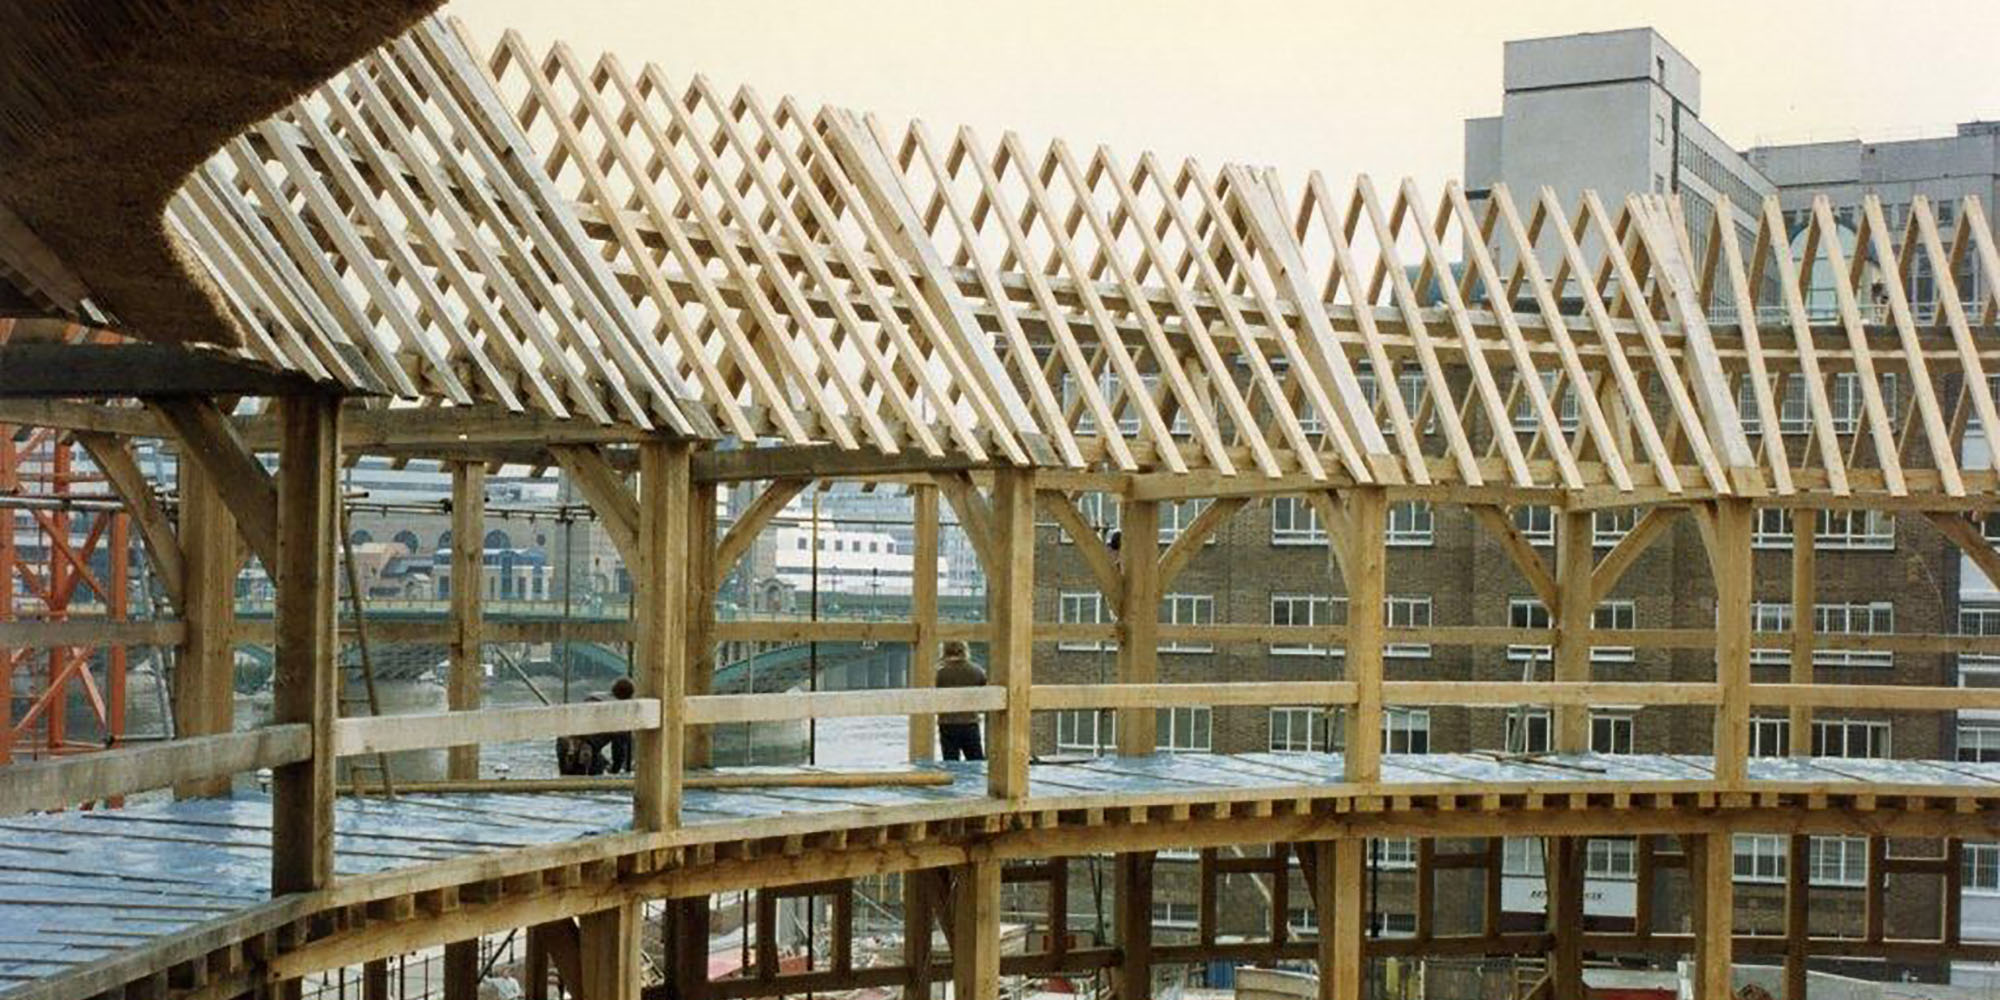 A portion of a circular timber frame.